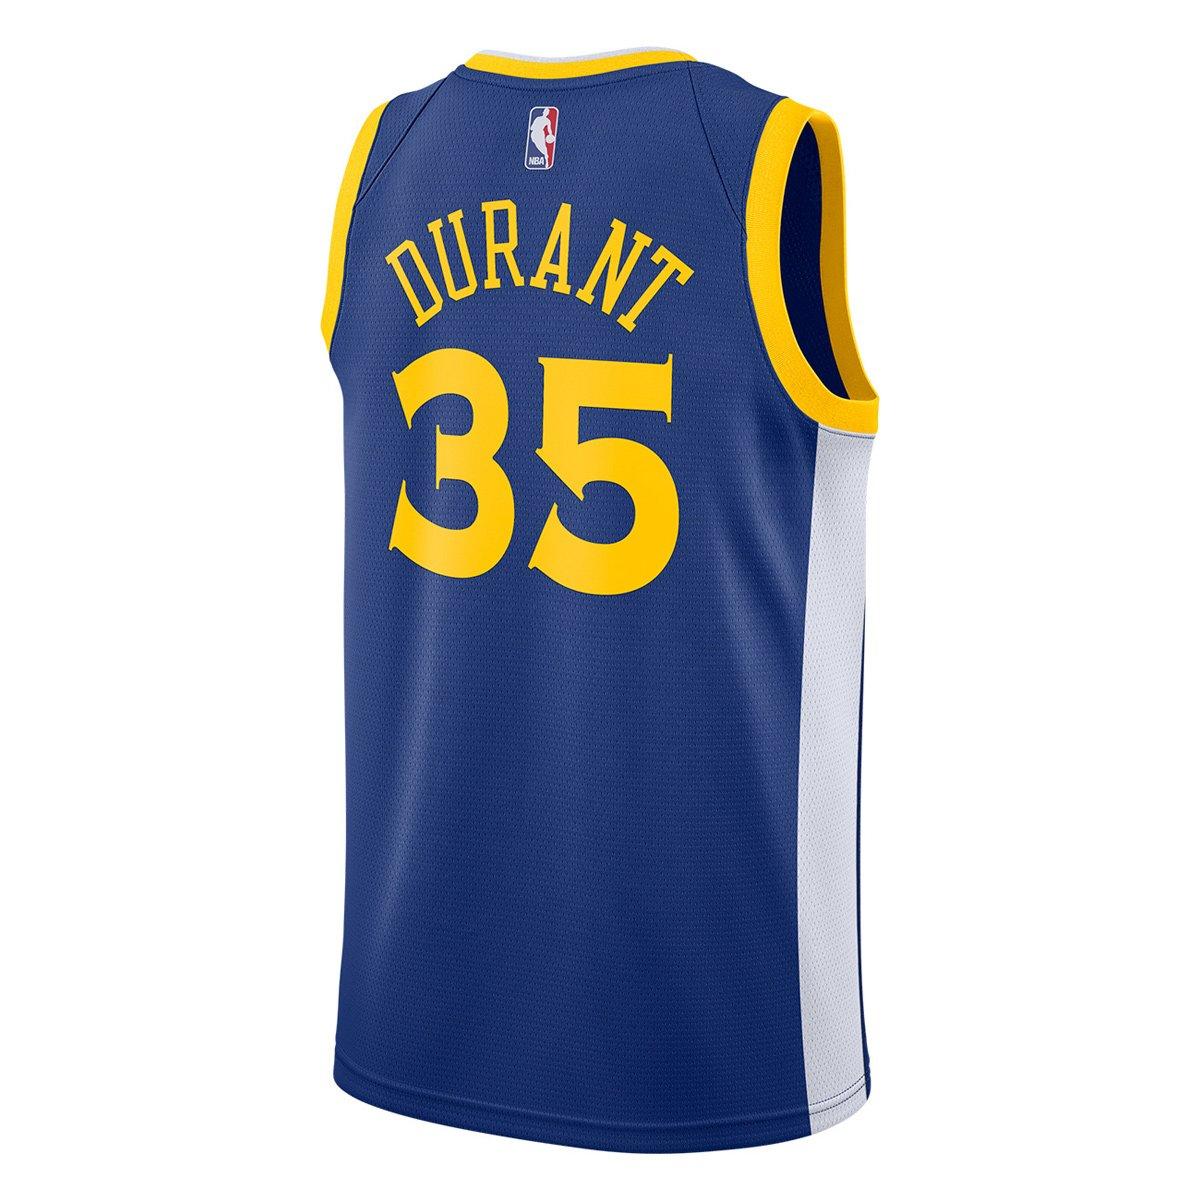 3f0a73ae69 ... Camiseta Regata Nike Golden State Warriors Swingman NBA - Kevin Durant  ...